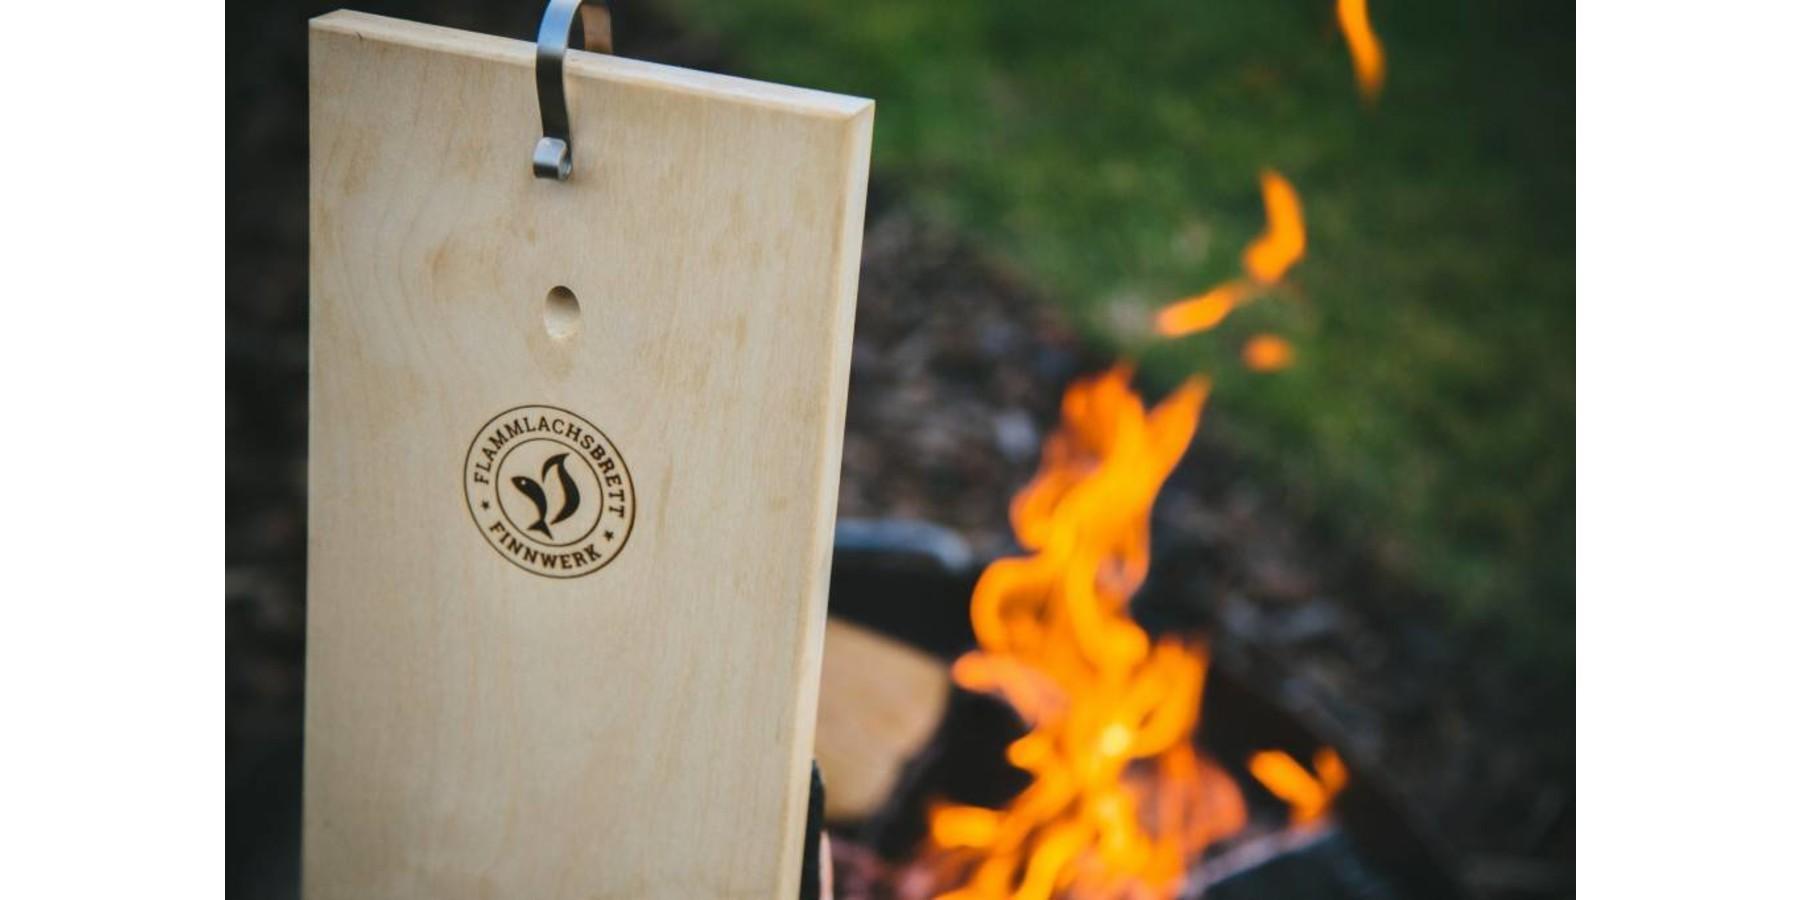 Flammlach rookplank - Enkele set